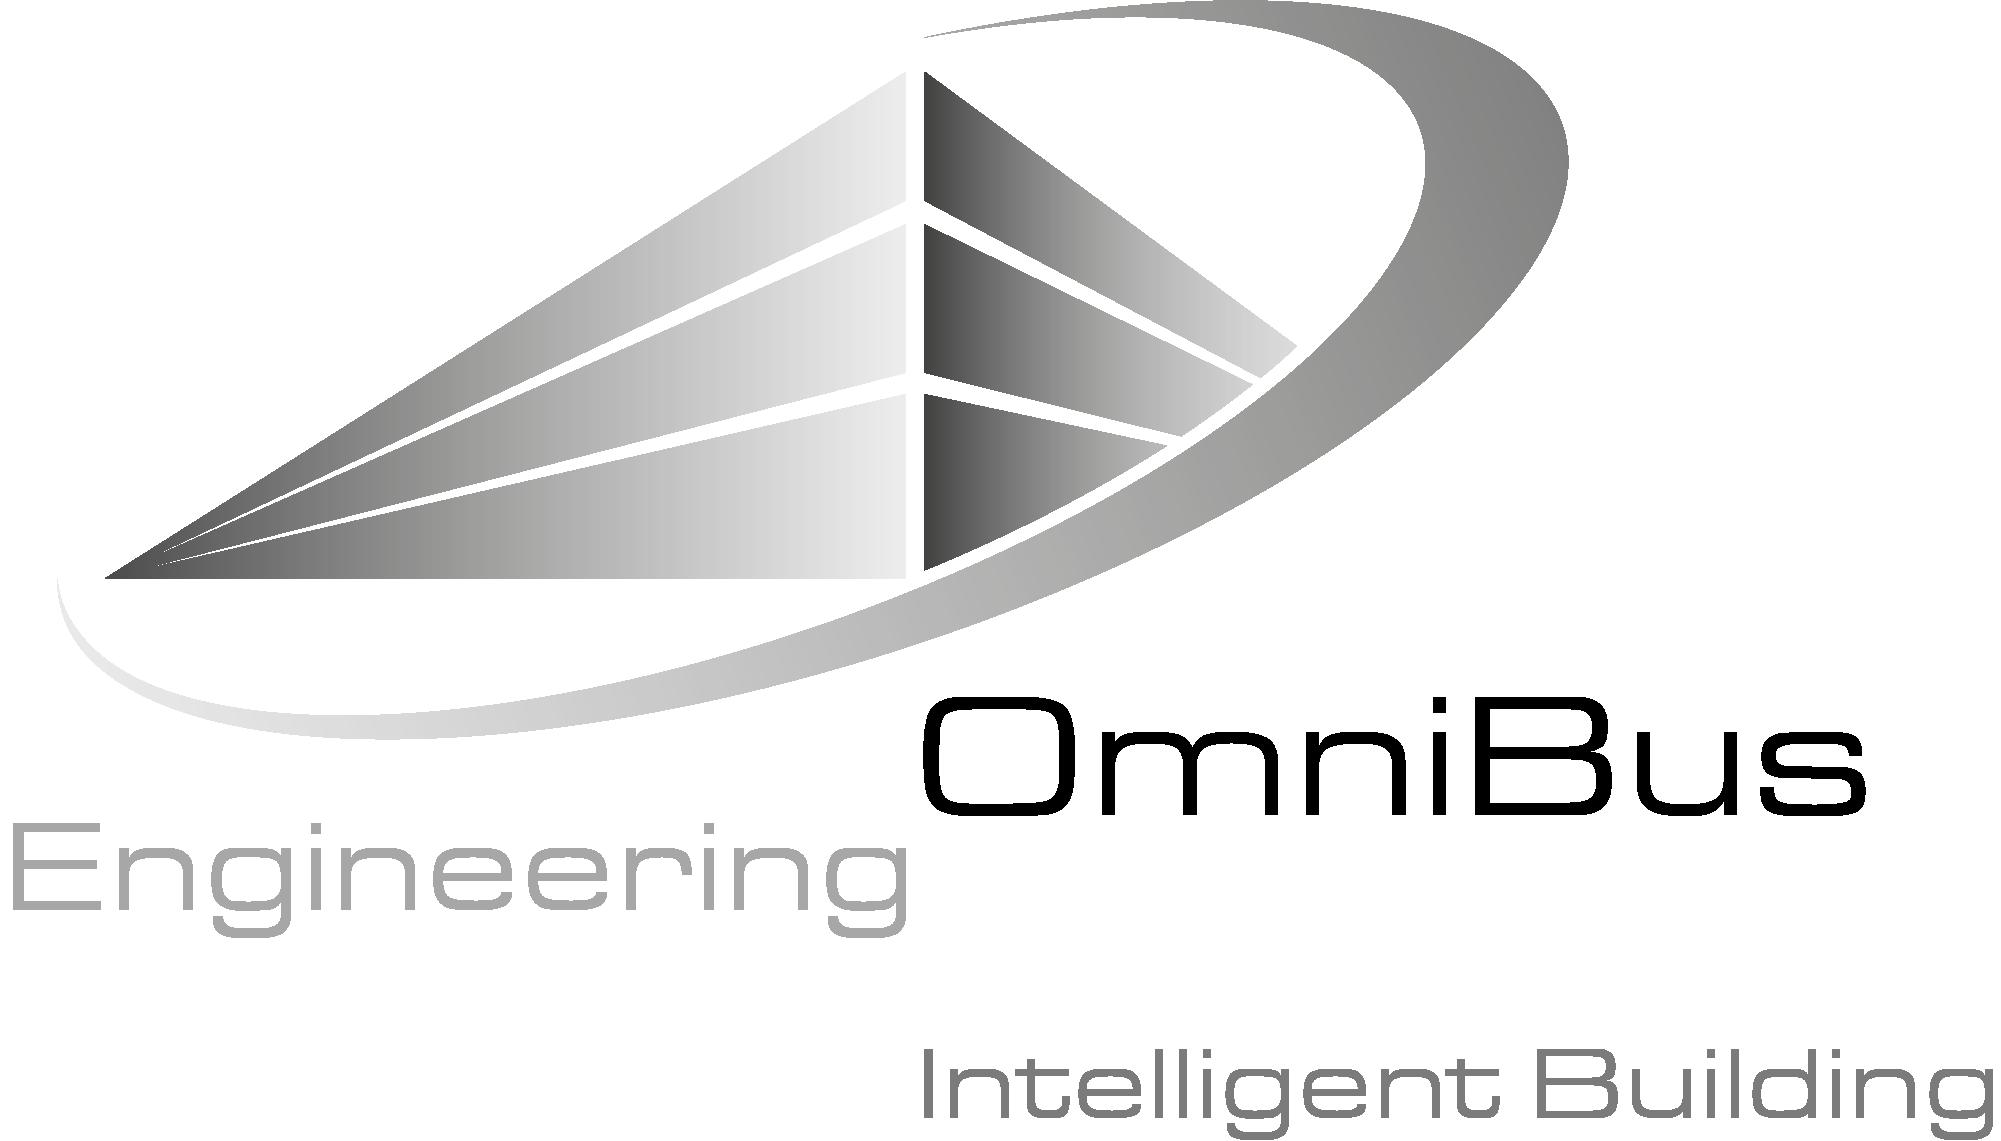 O.E.OmniBus Engineering Sa